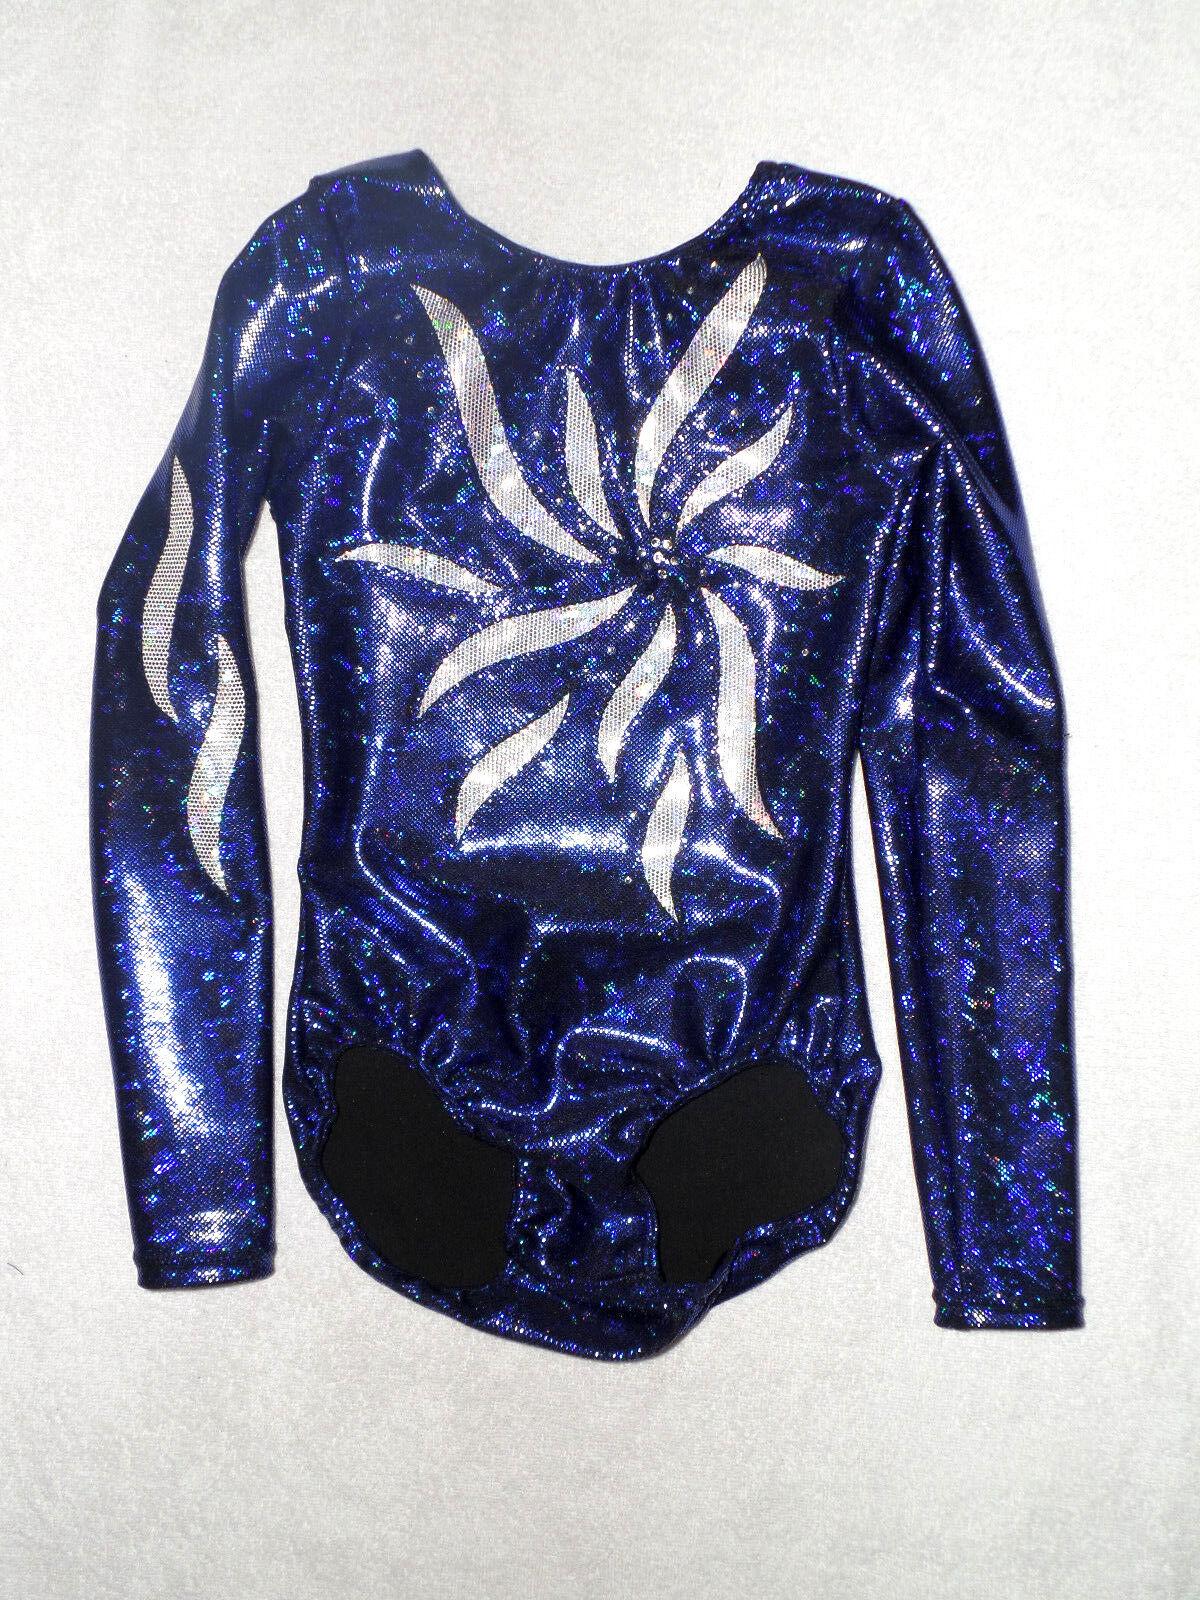 Leotard Gymnastics Suit 'KIM LA holoblau  NEW Größe 122 to 164